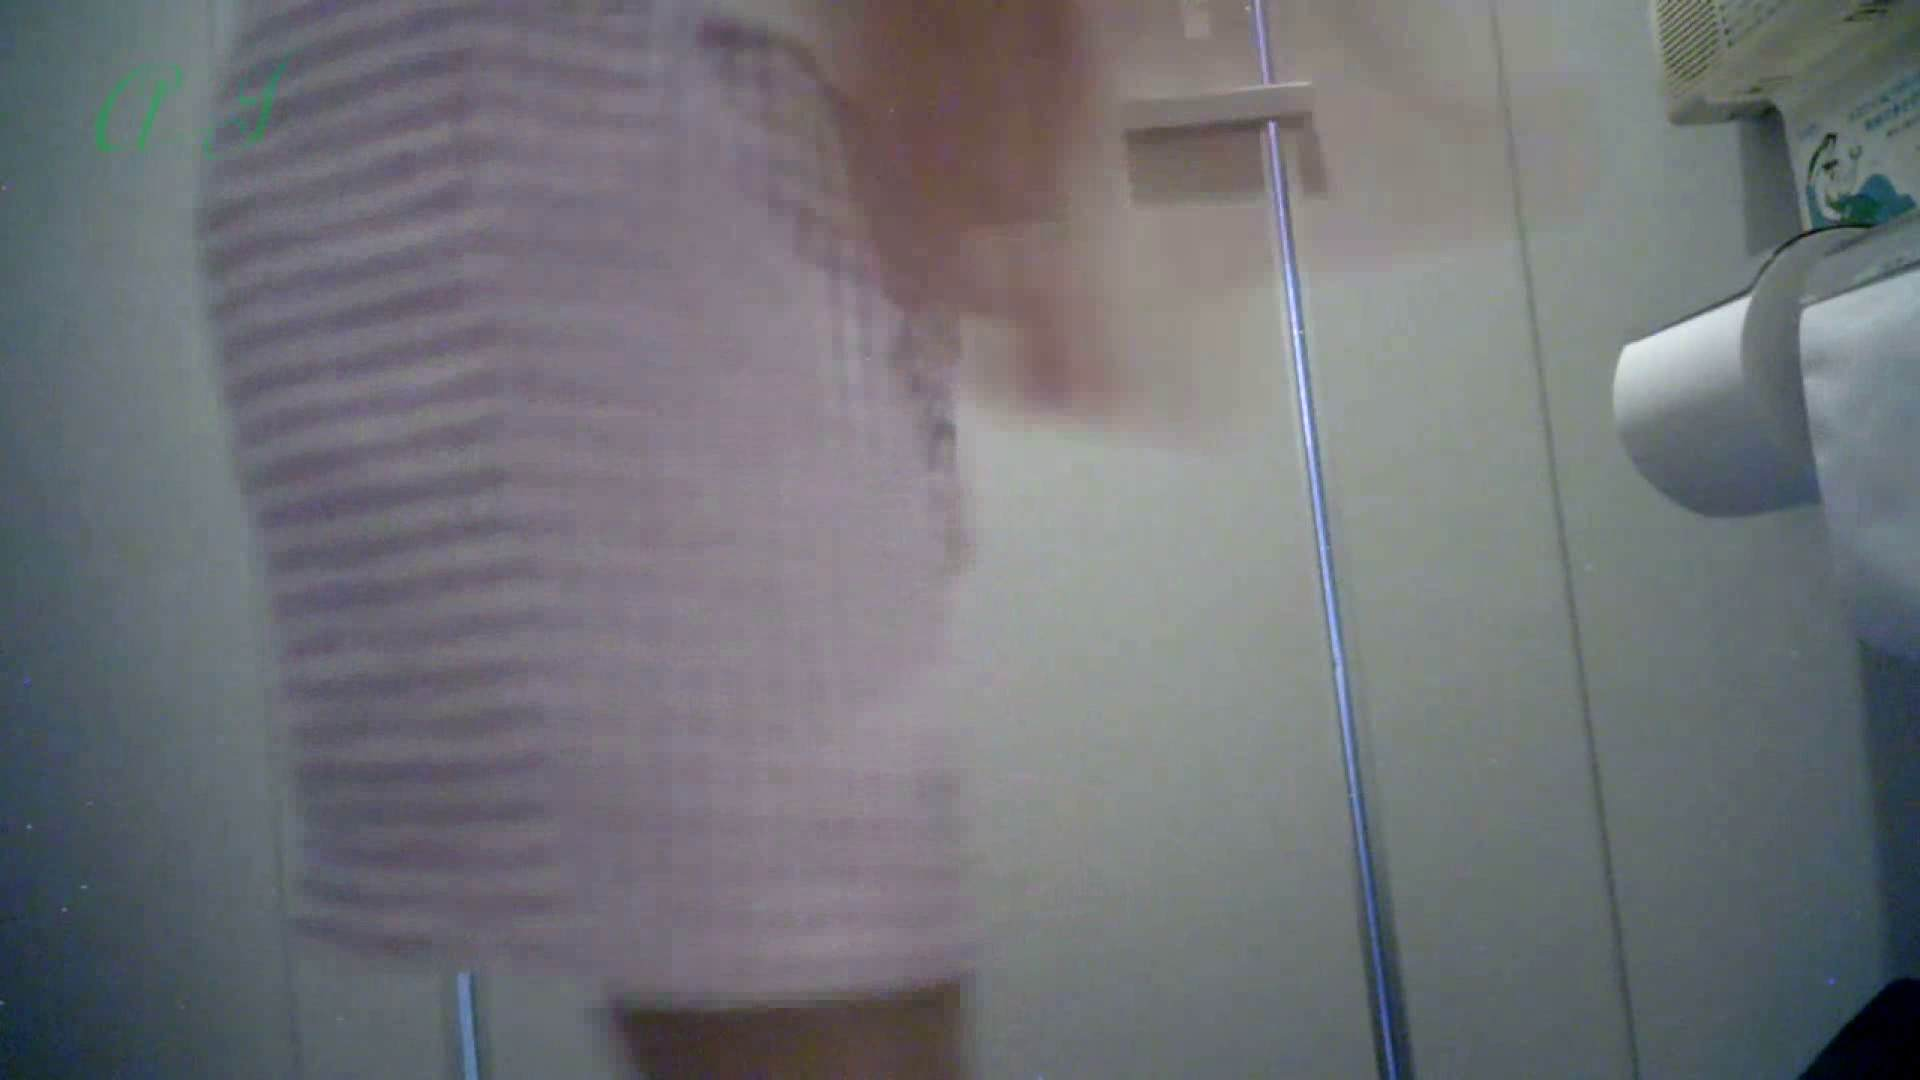 有名大学女性洗面所 vol.67トイレの女神さま♪ 洗面所編 濡れ場動画紹介 89PIX 42